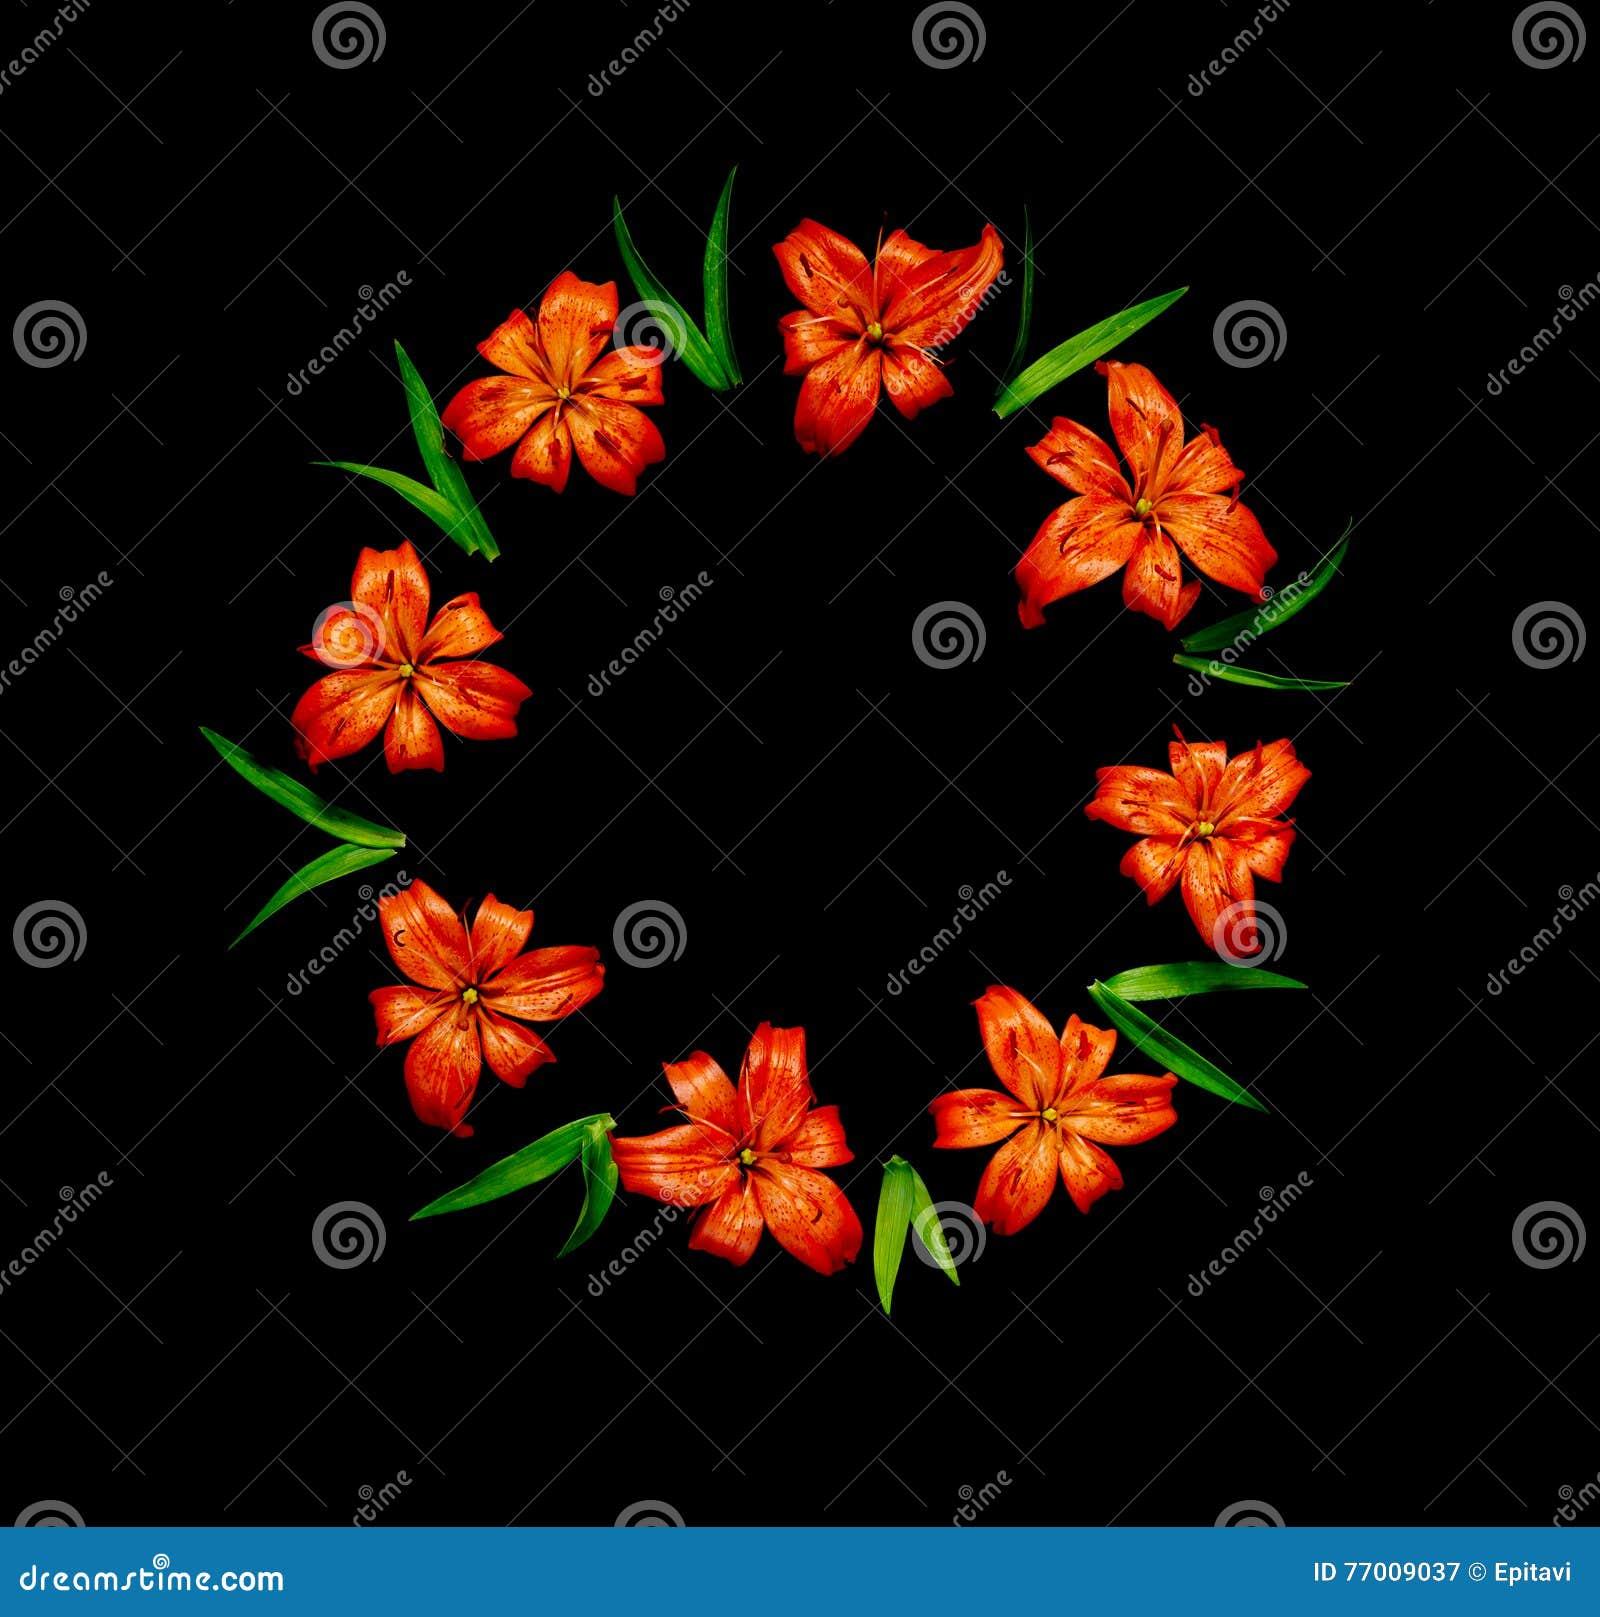 11 Gorgeous Ͽ� Black� Blooms: Orange Lily On Black Background Stock Photo